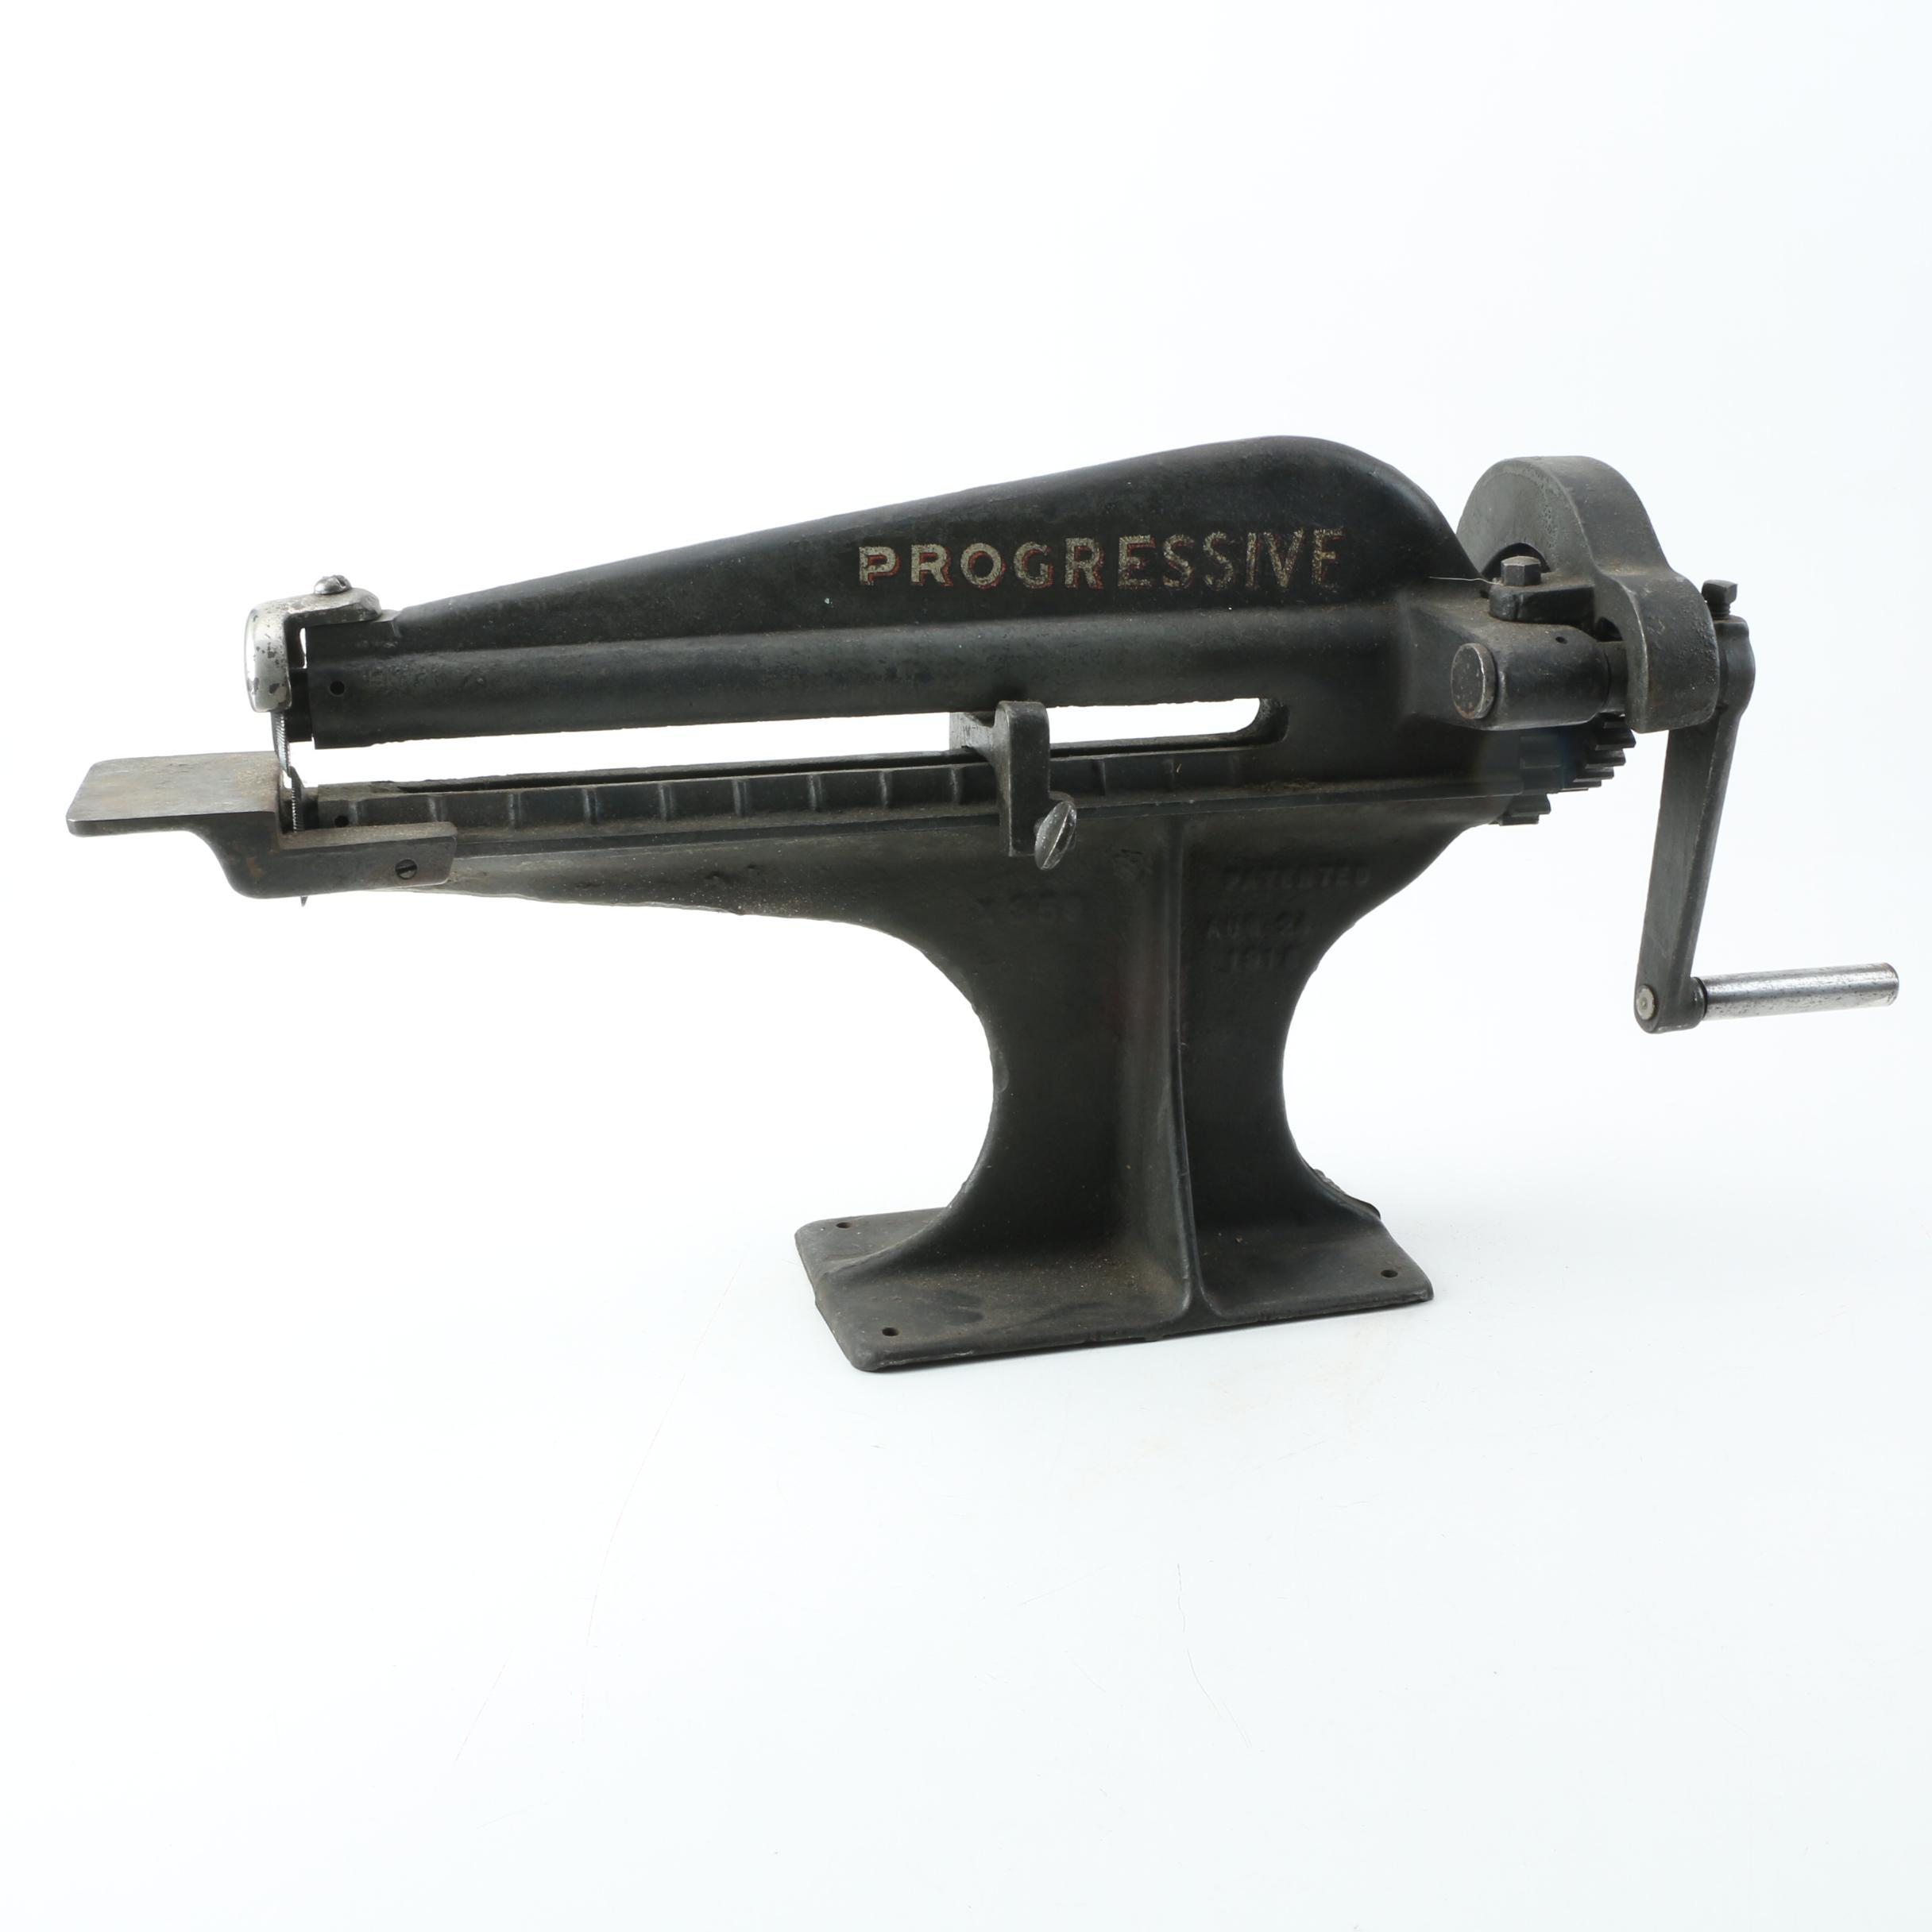 Vintage Progressive X359 Rotary Sheet Metal Cutter